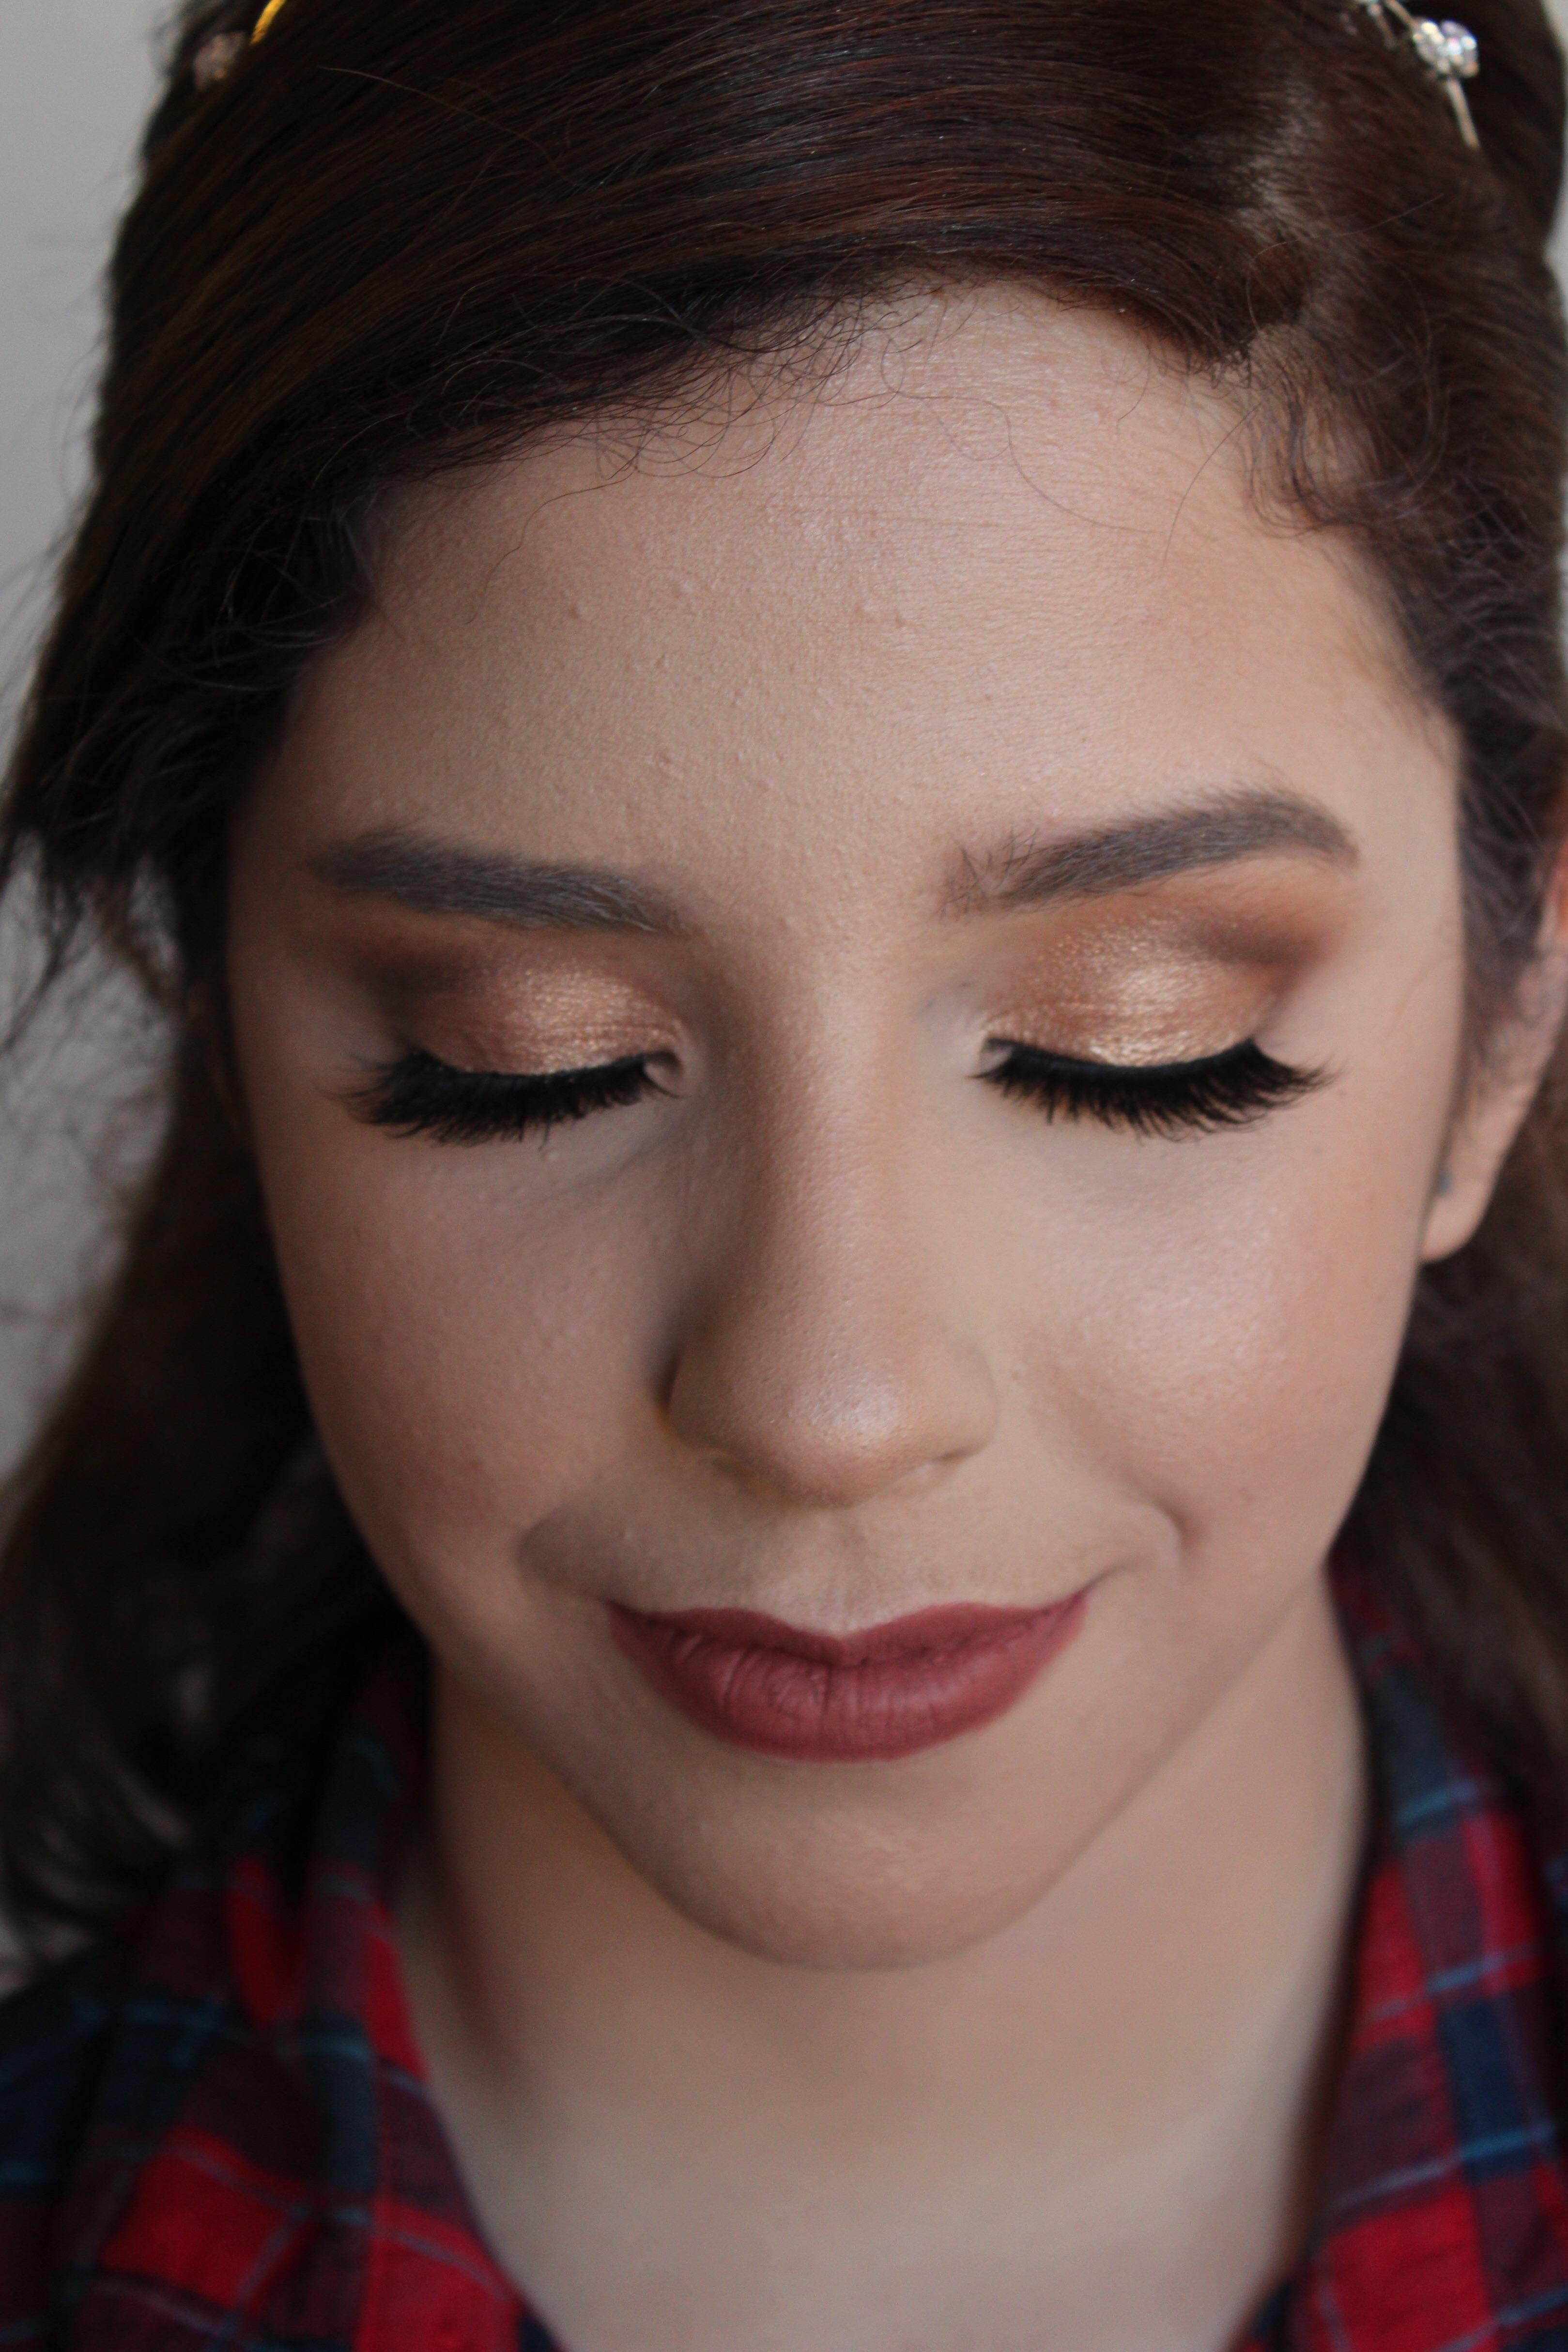 Bridal makeup I did recently CCW